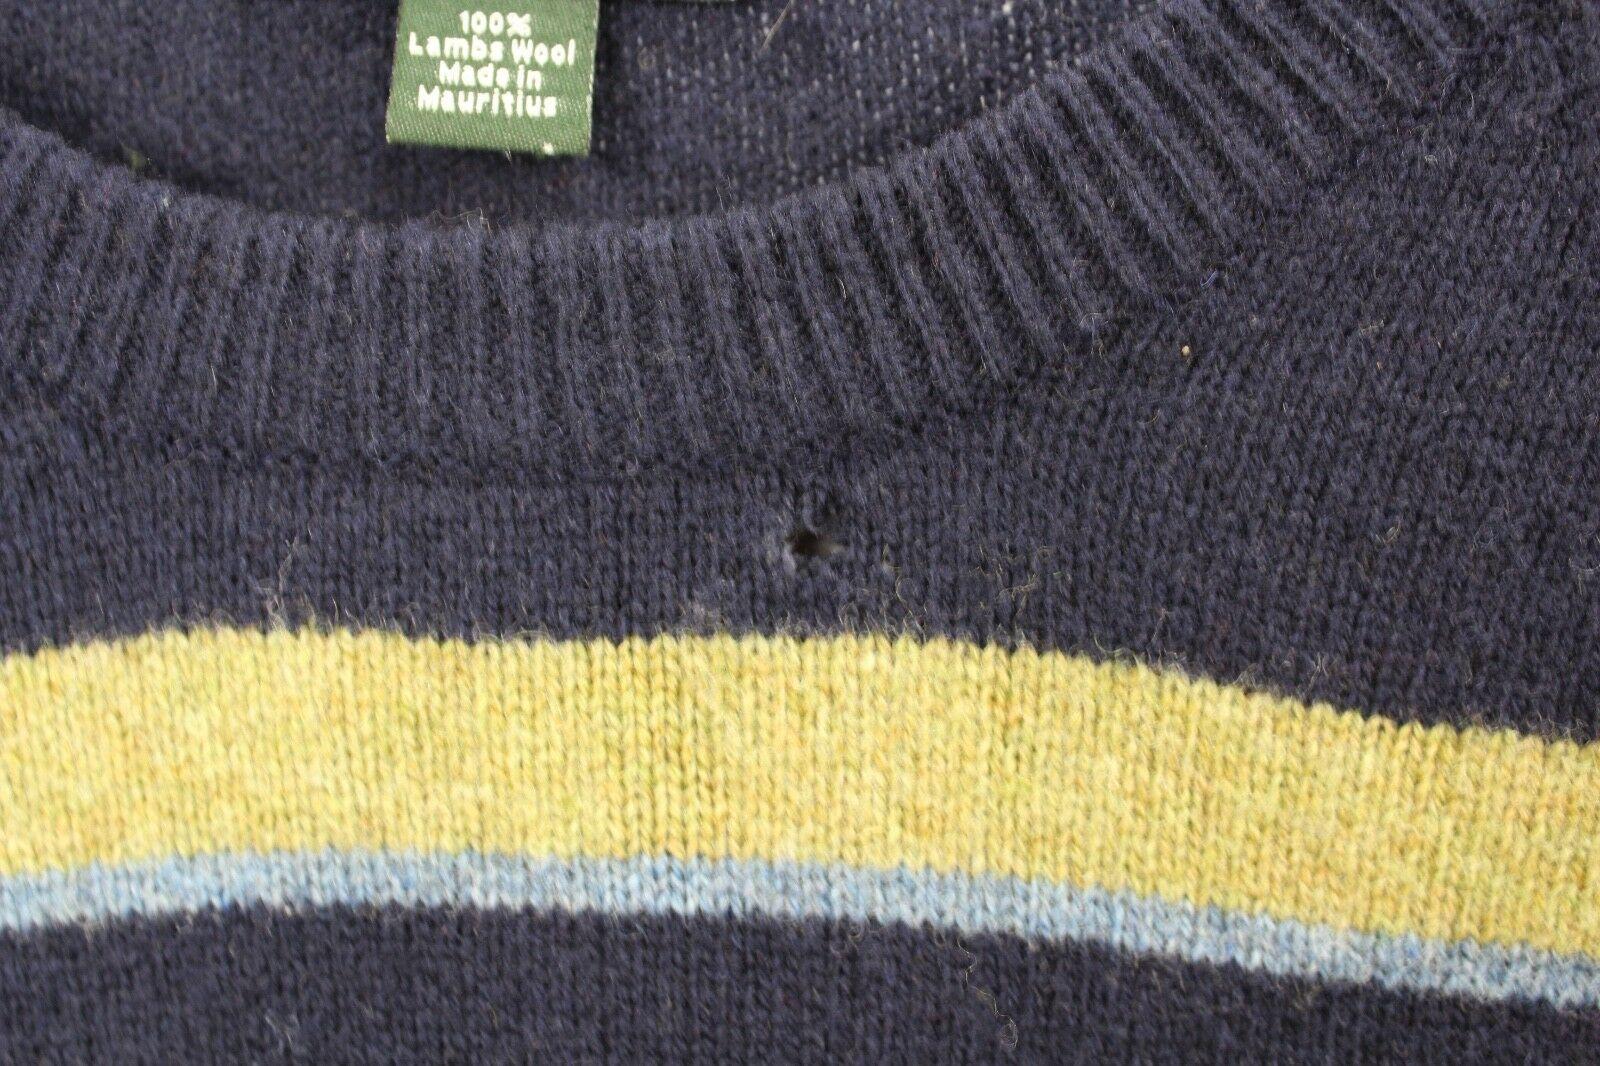 J Crew Mens Medium Lambswool Striped Casual Fall Crewneck Sweater Blue Green